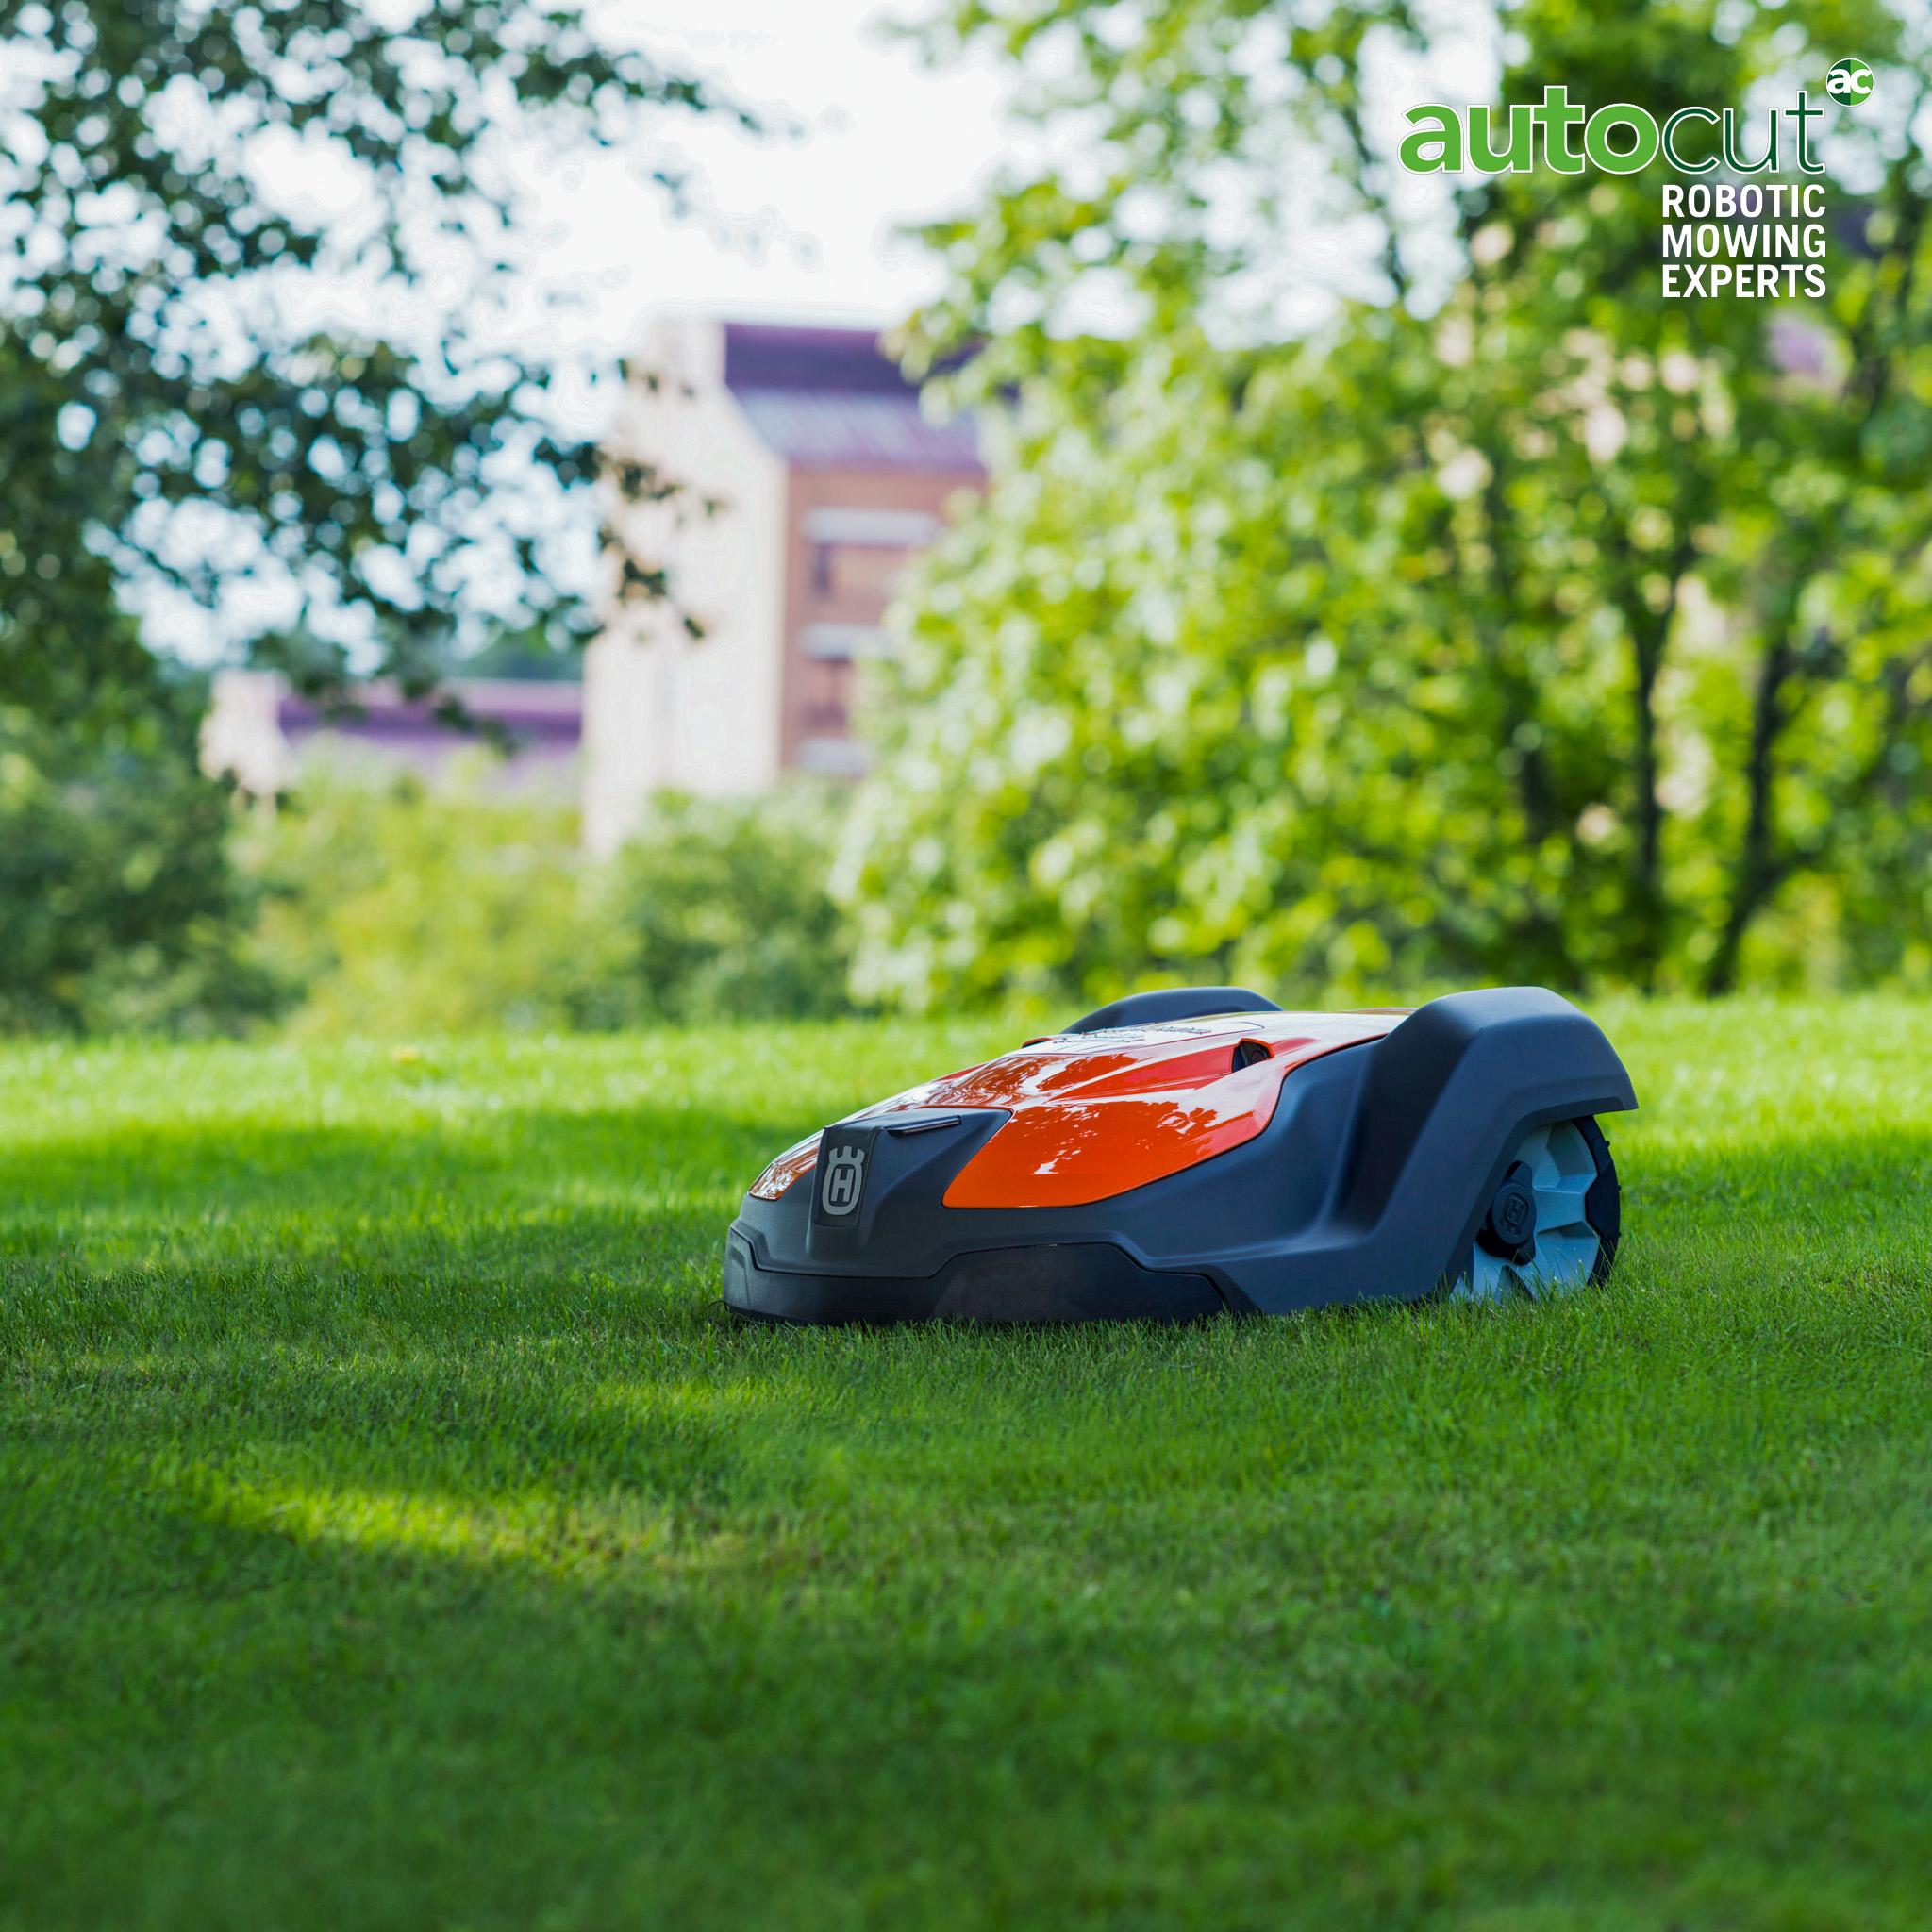 Meet the Mower: Automower® 550